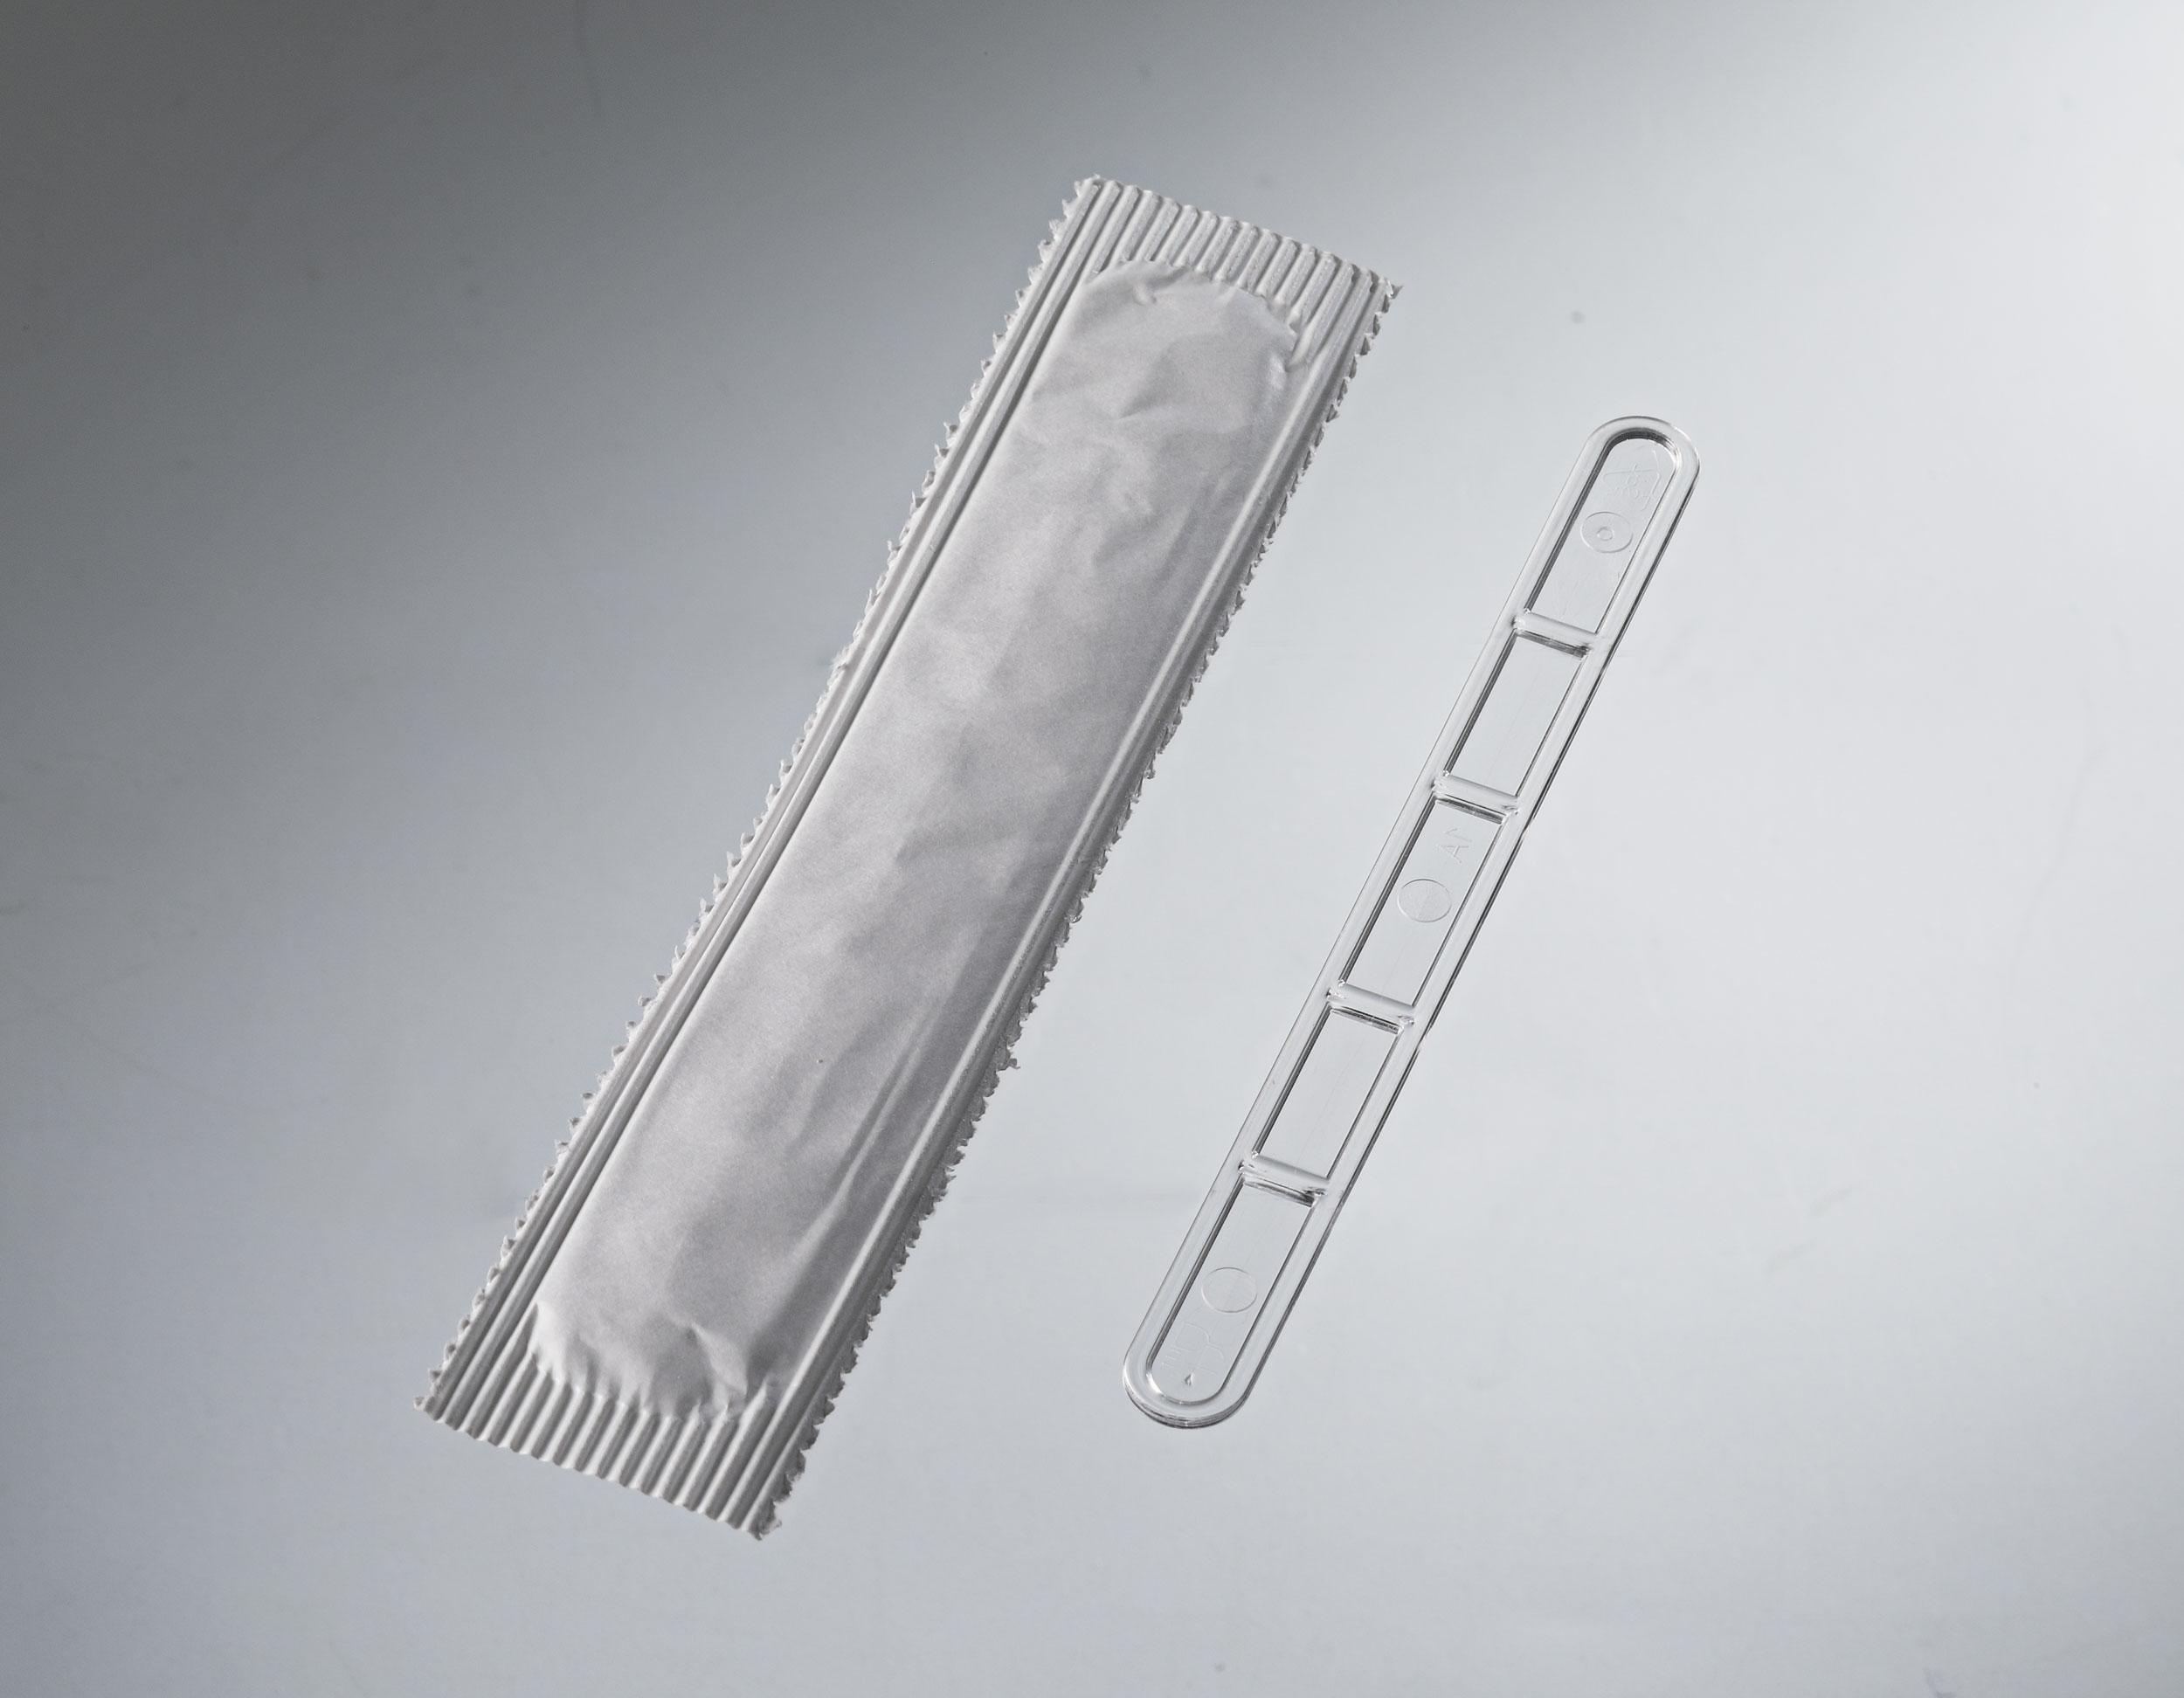 inc-autom-105mm